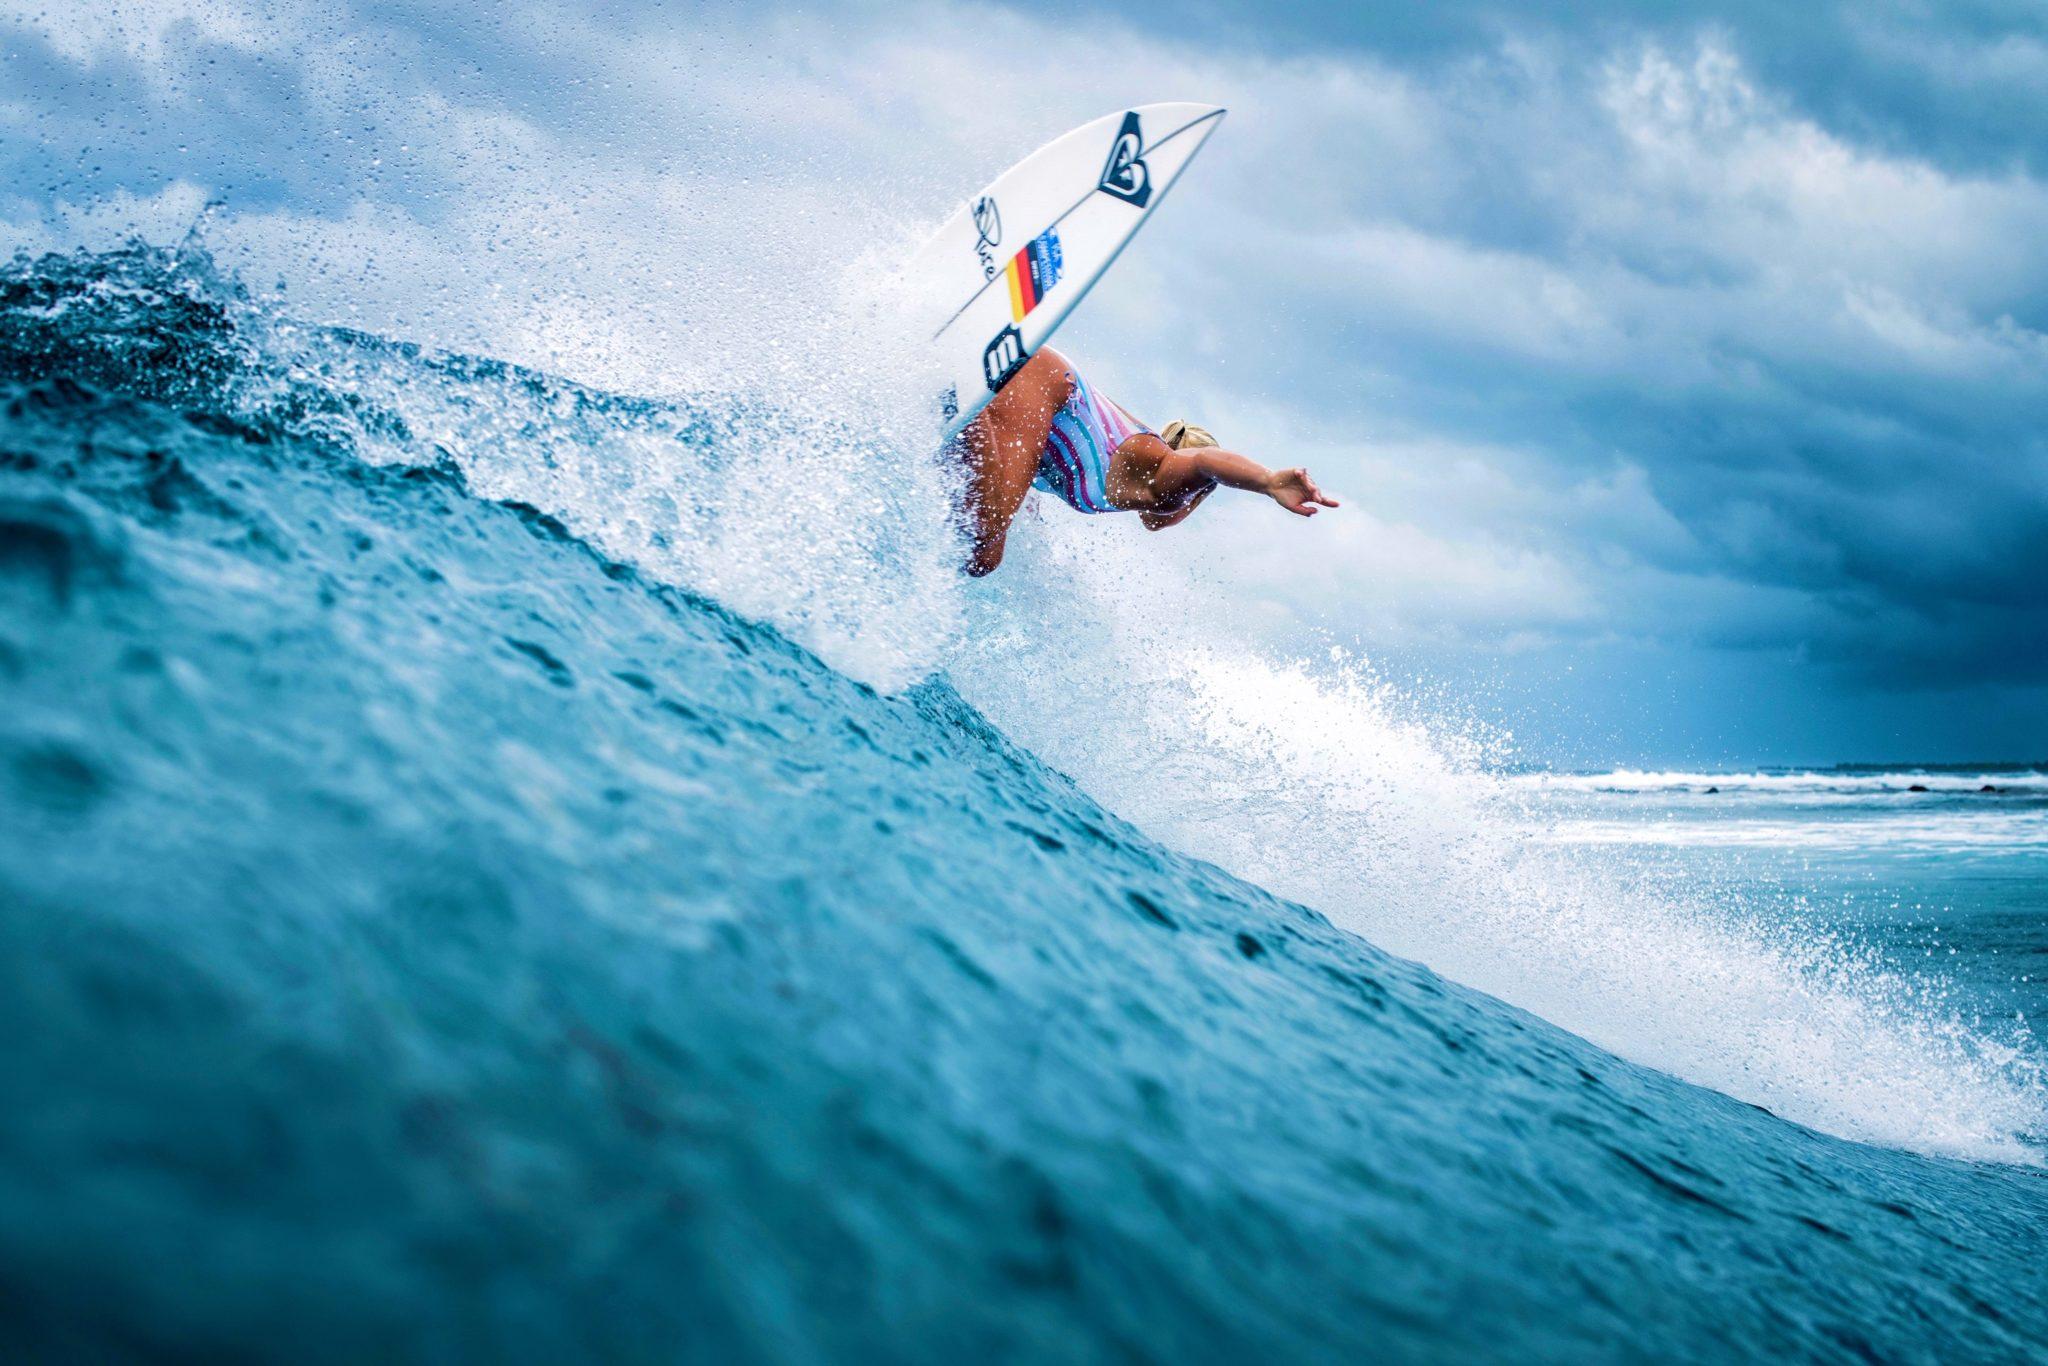 Rosina Neuerer surft gerne am Hotspot Malediven